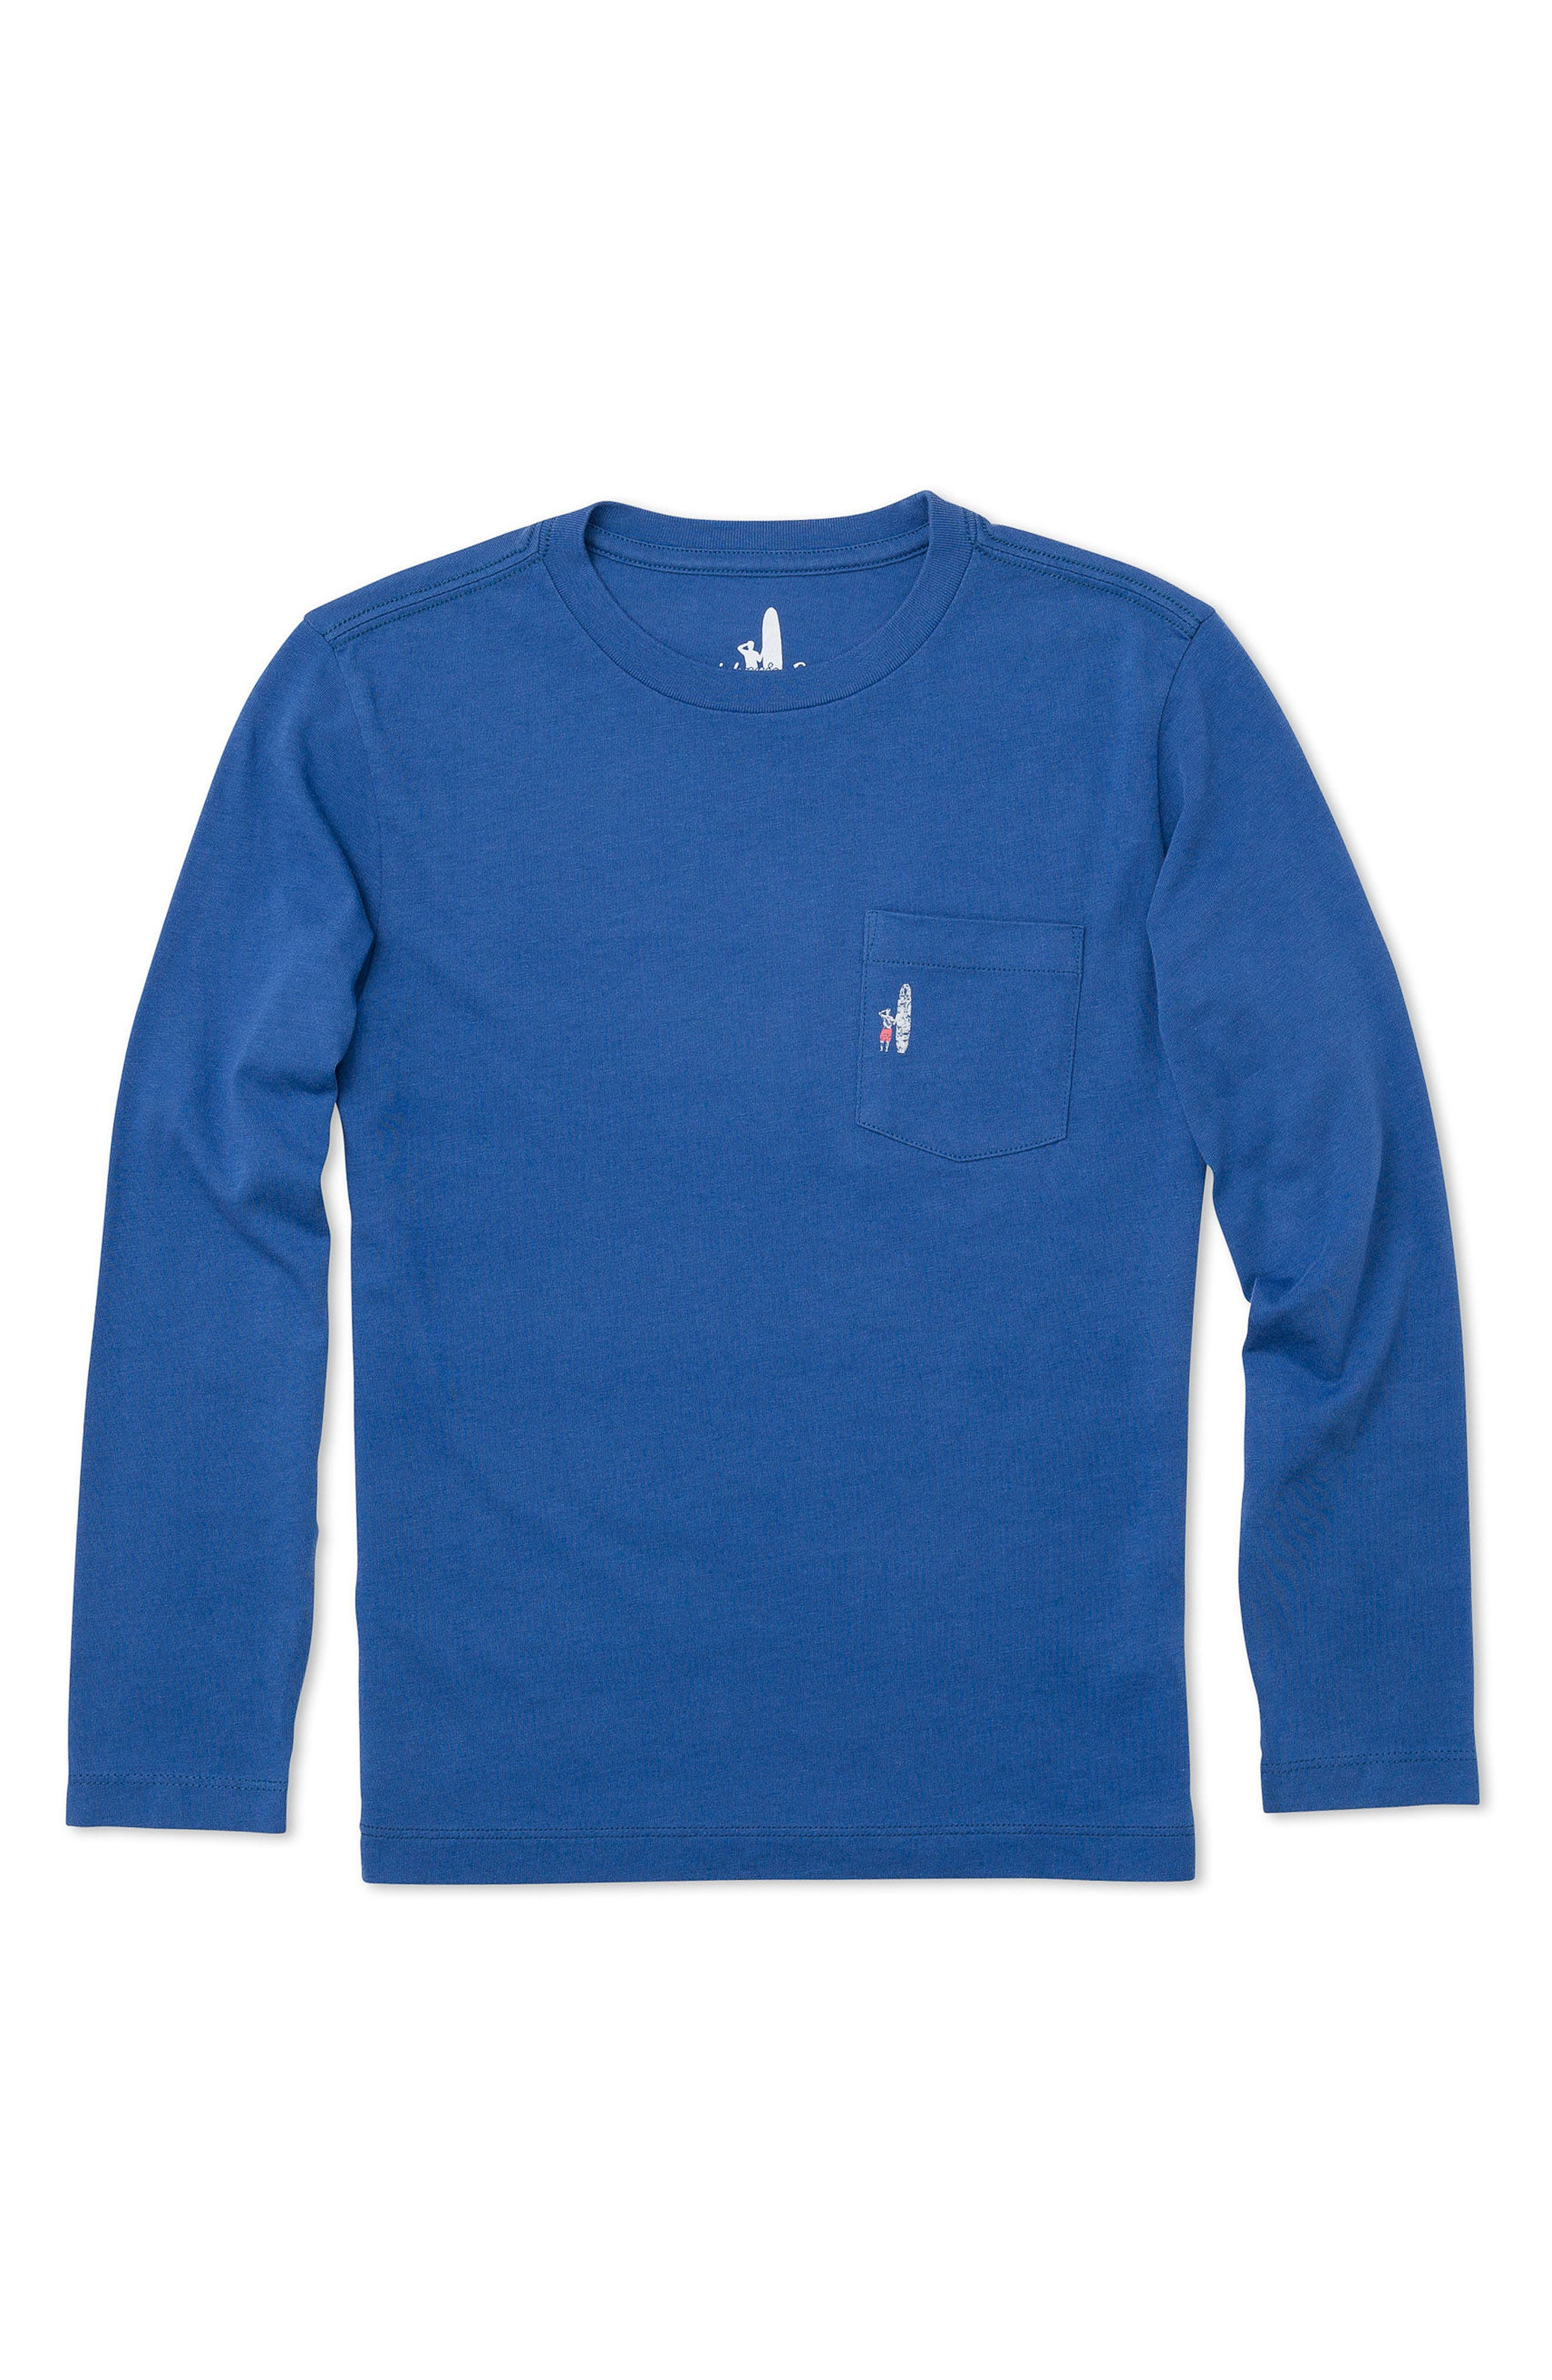 Alternate Image 1 Selected - johnnie-O Reef Break Long-Sleeve Pocket T-Shirt (Little Boys & Big Boys)